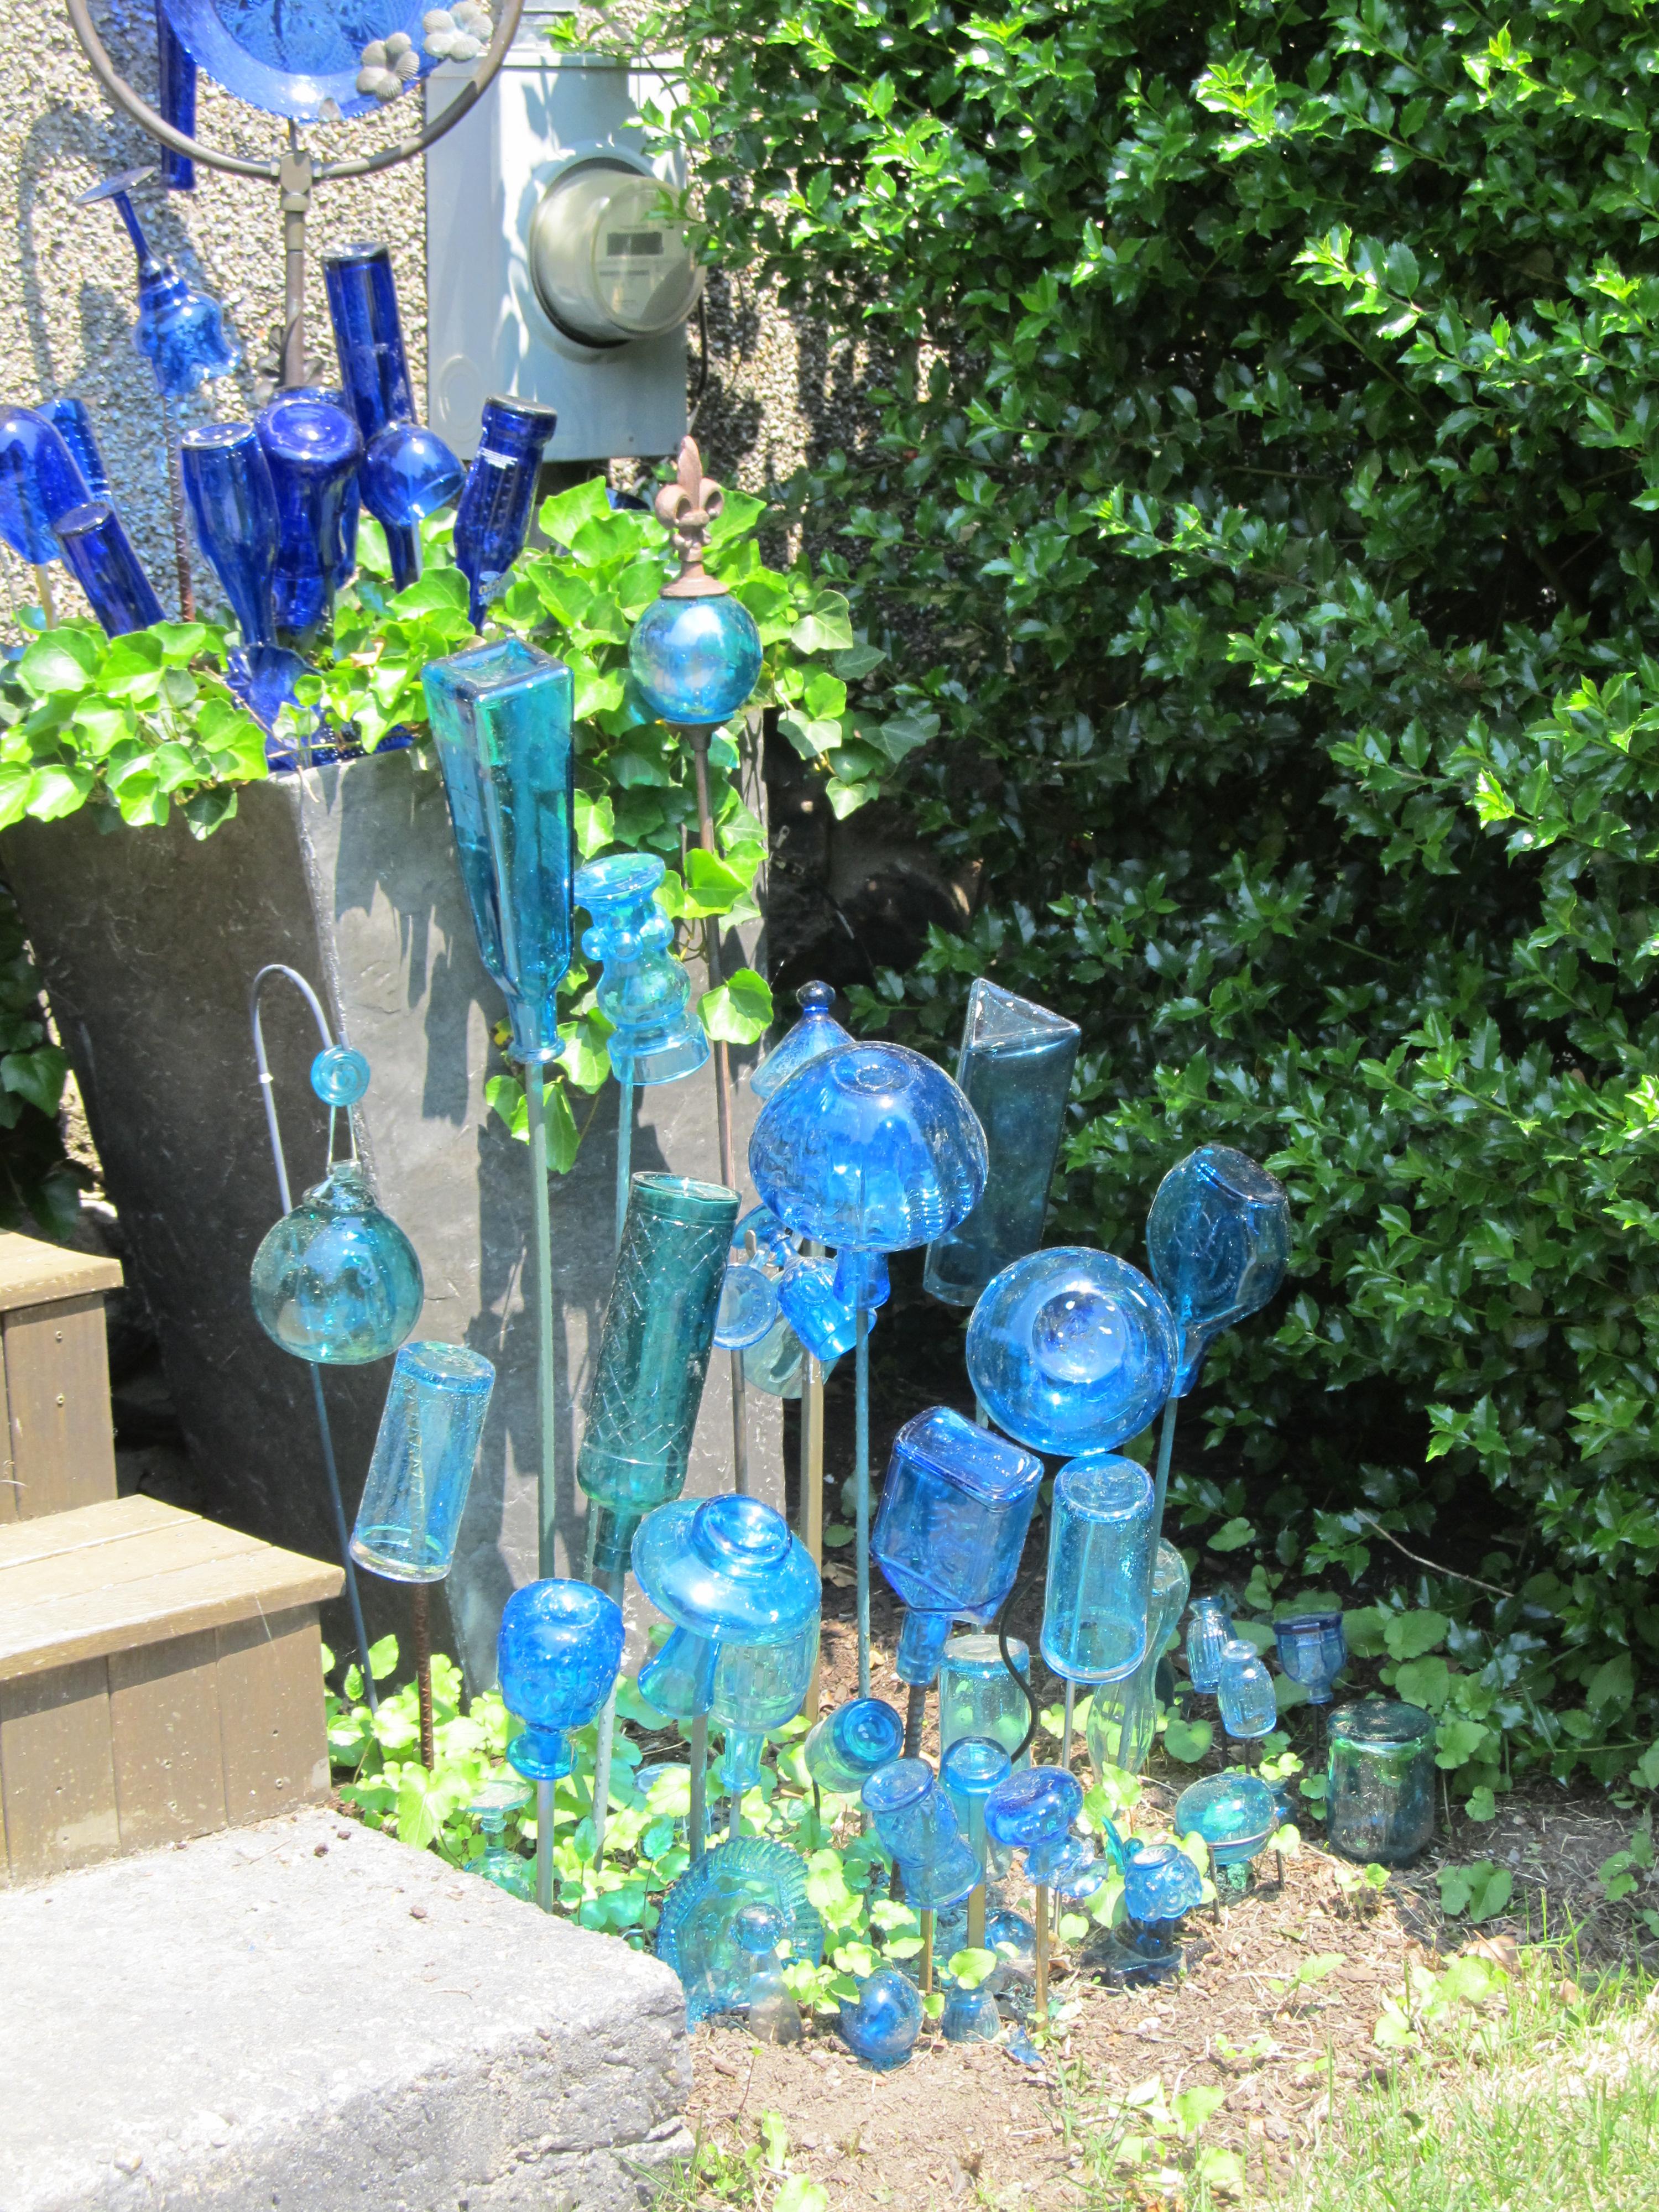 bradford house torquoise bottle tree section